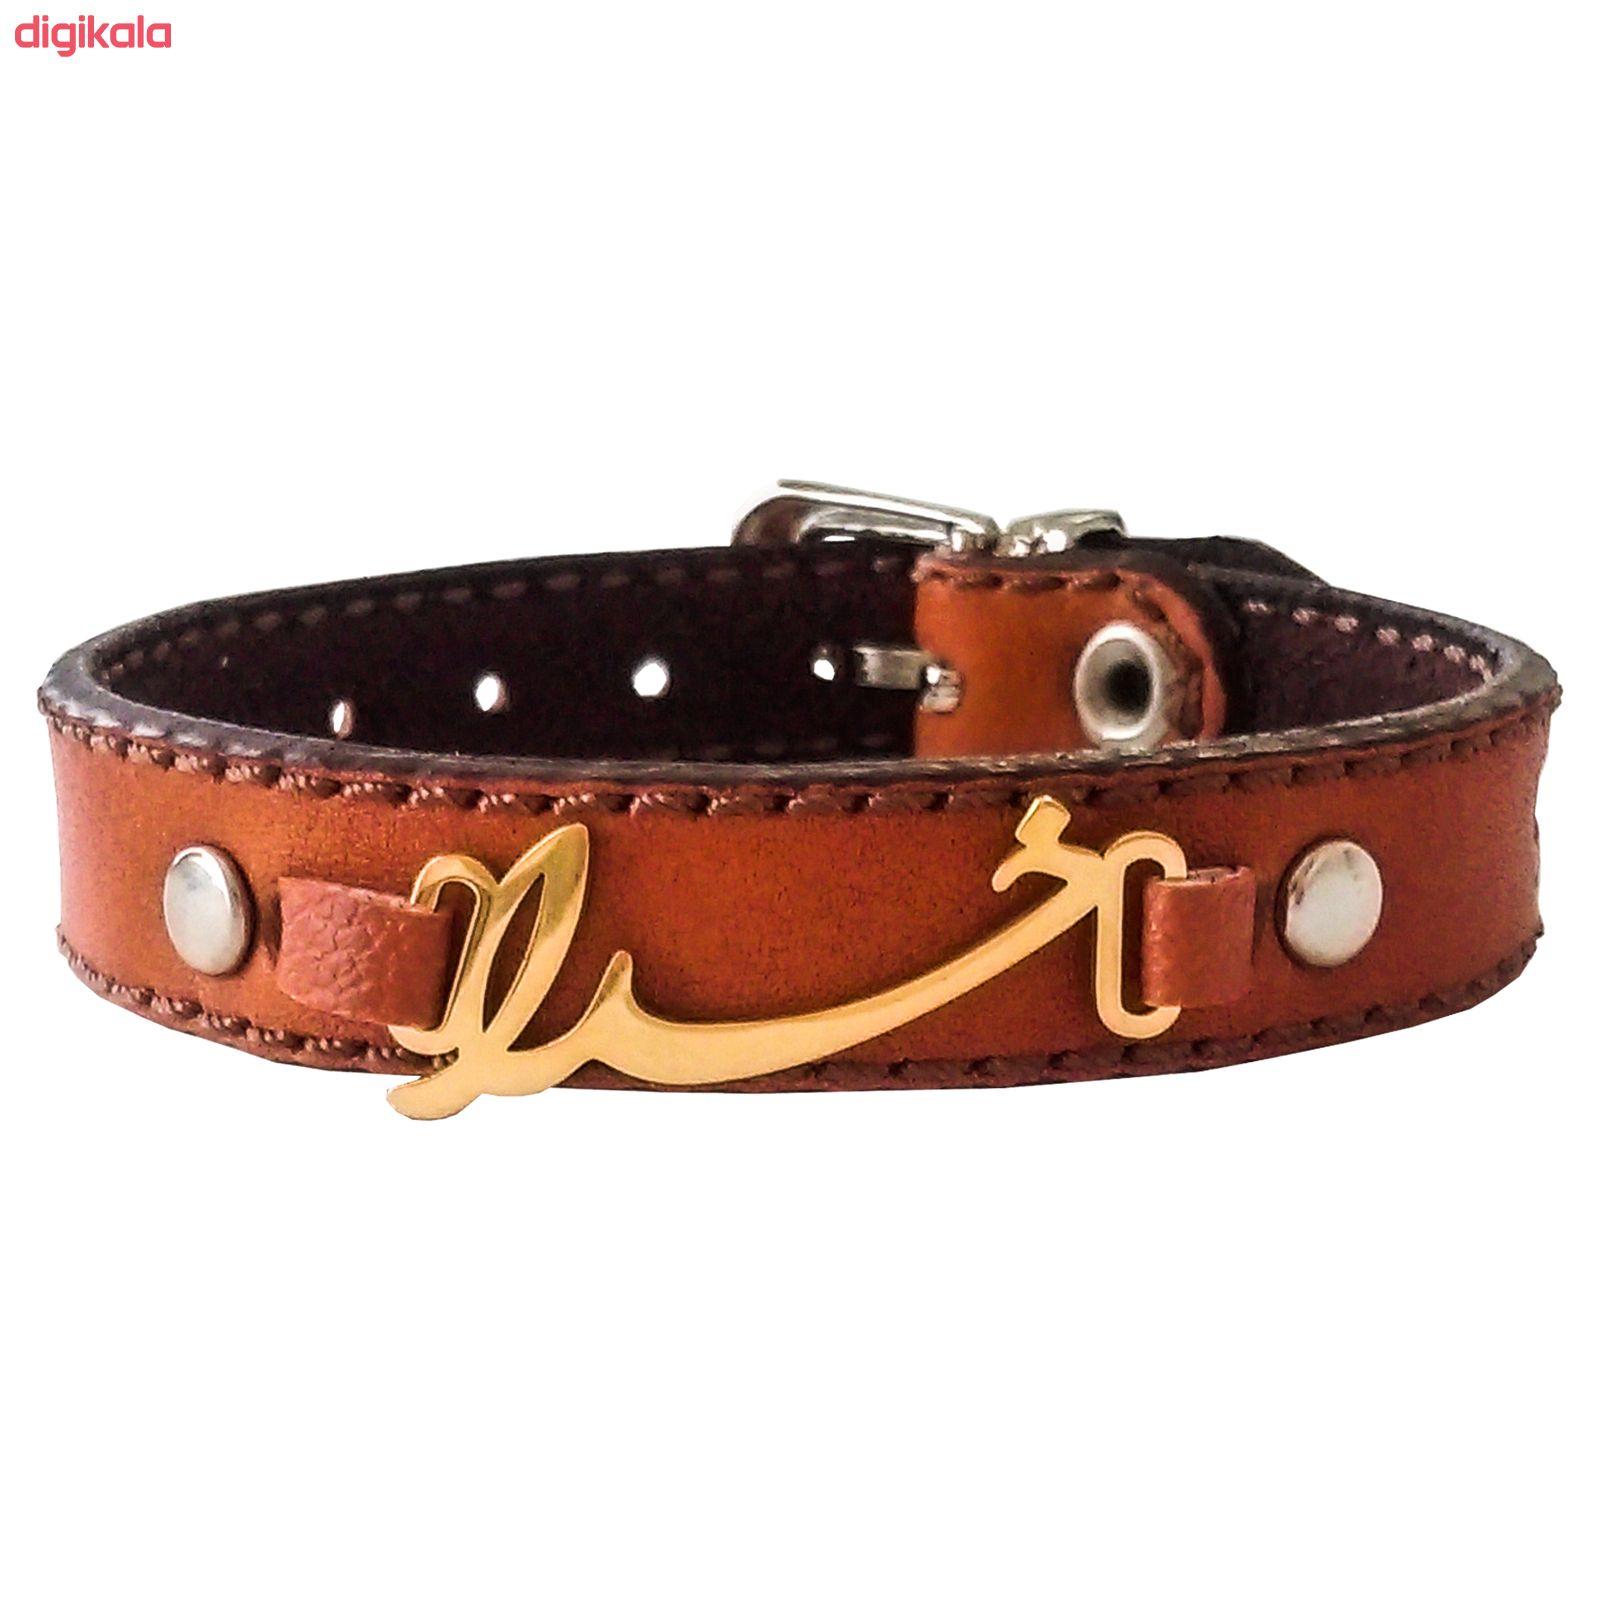 دستبند چرم وارک طرح خدا مدل پرهام کد rb50 main 1 4